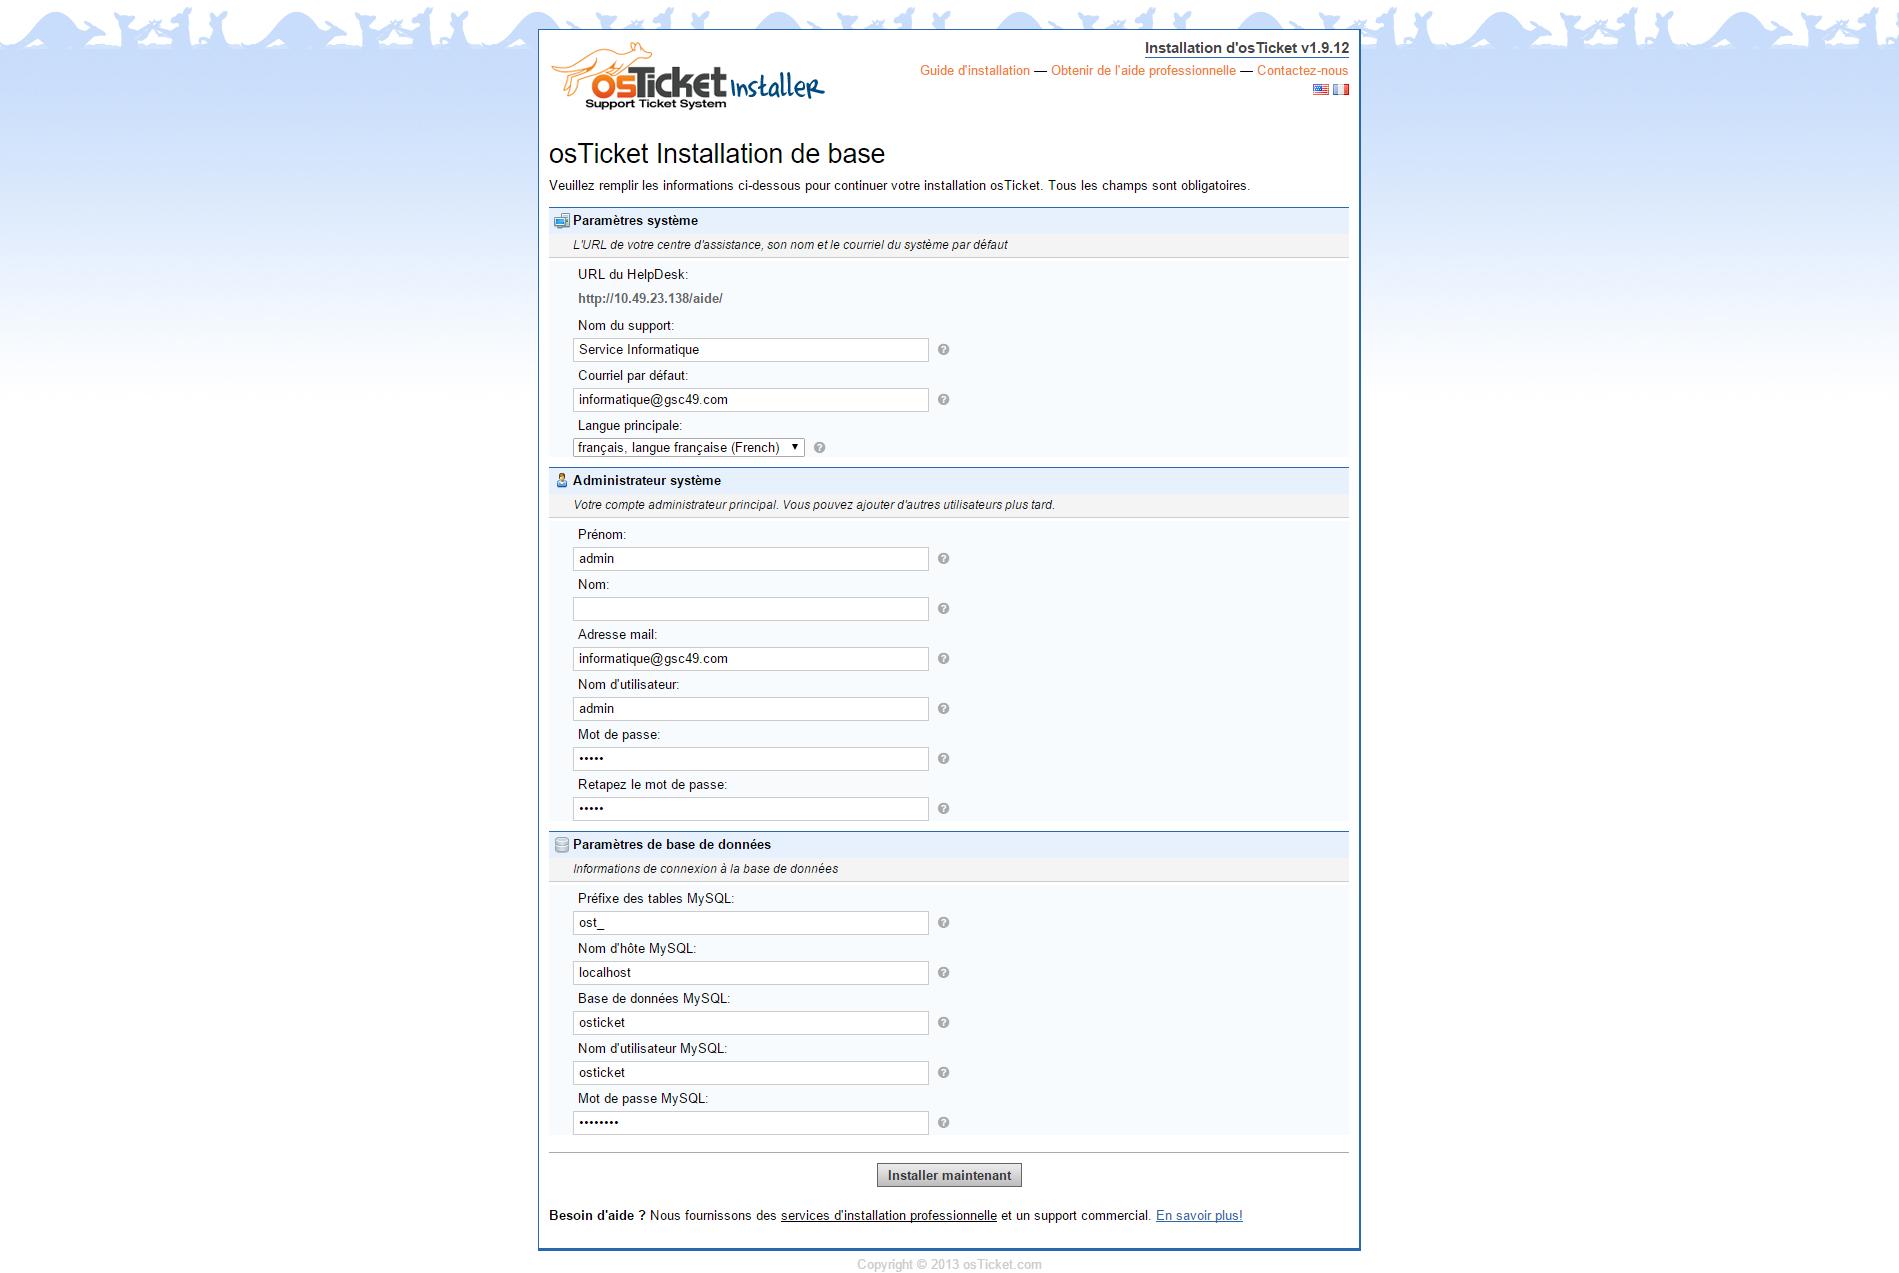 FireShot Capture 4 - osTicket installateur - http___10.49.23.138_aide_setup_install.php